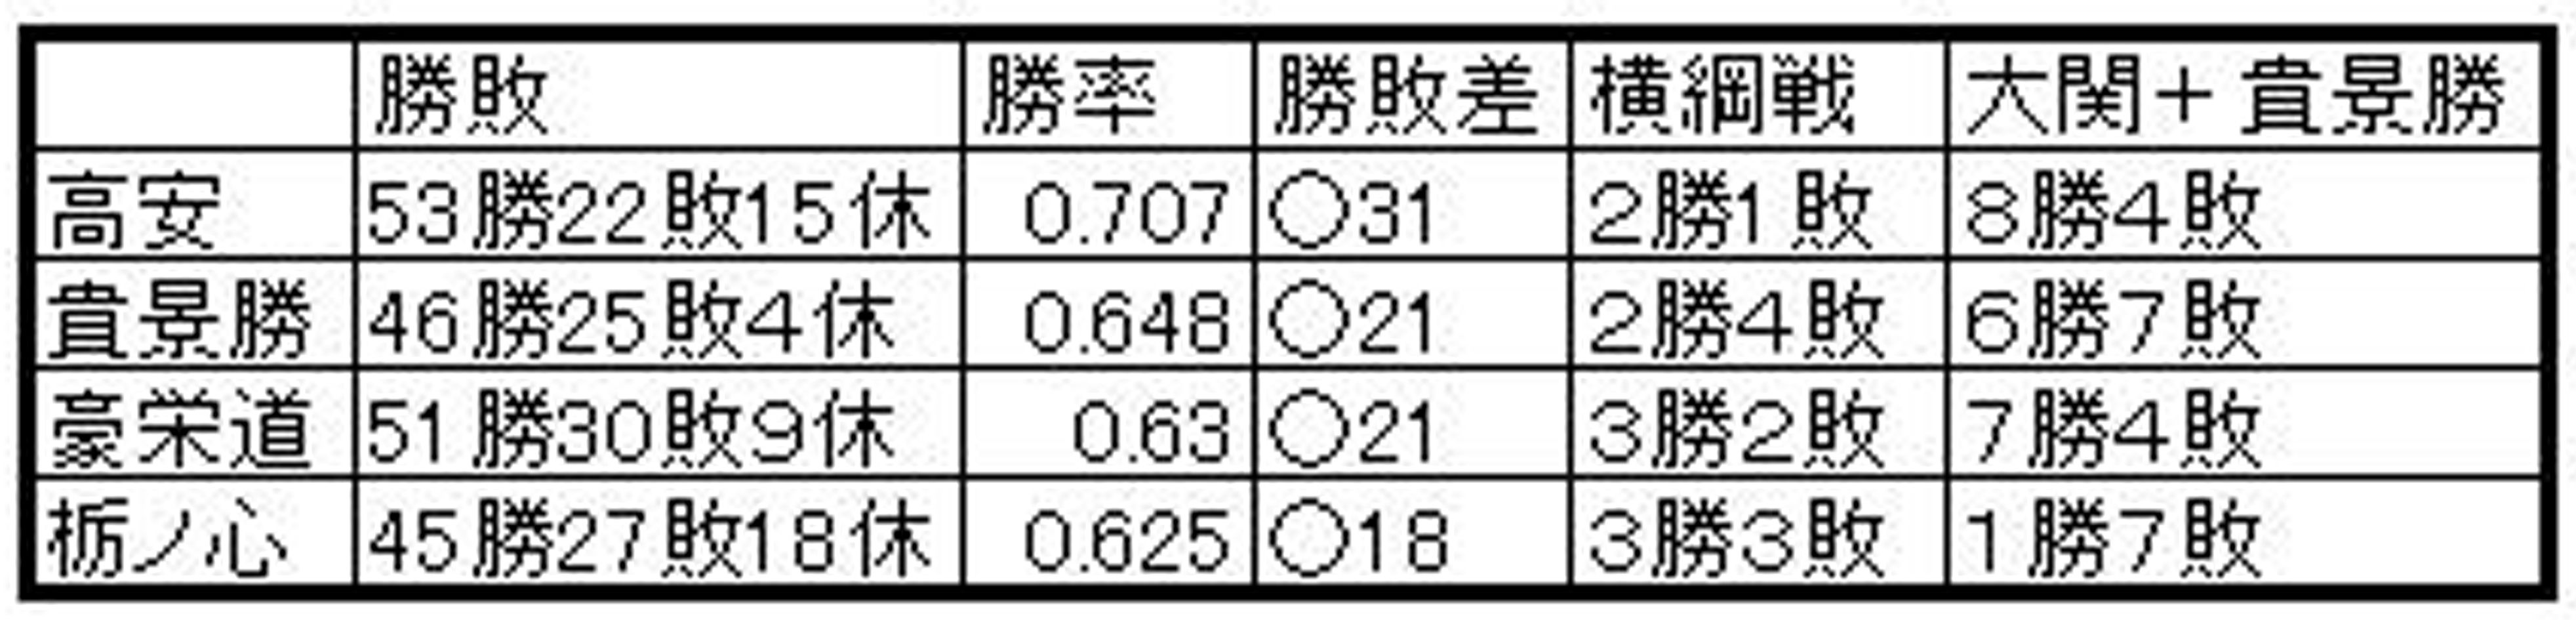 貴景勝&大関A